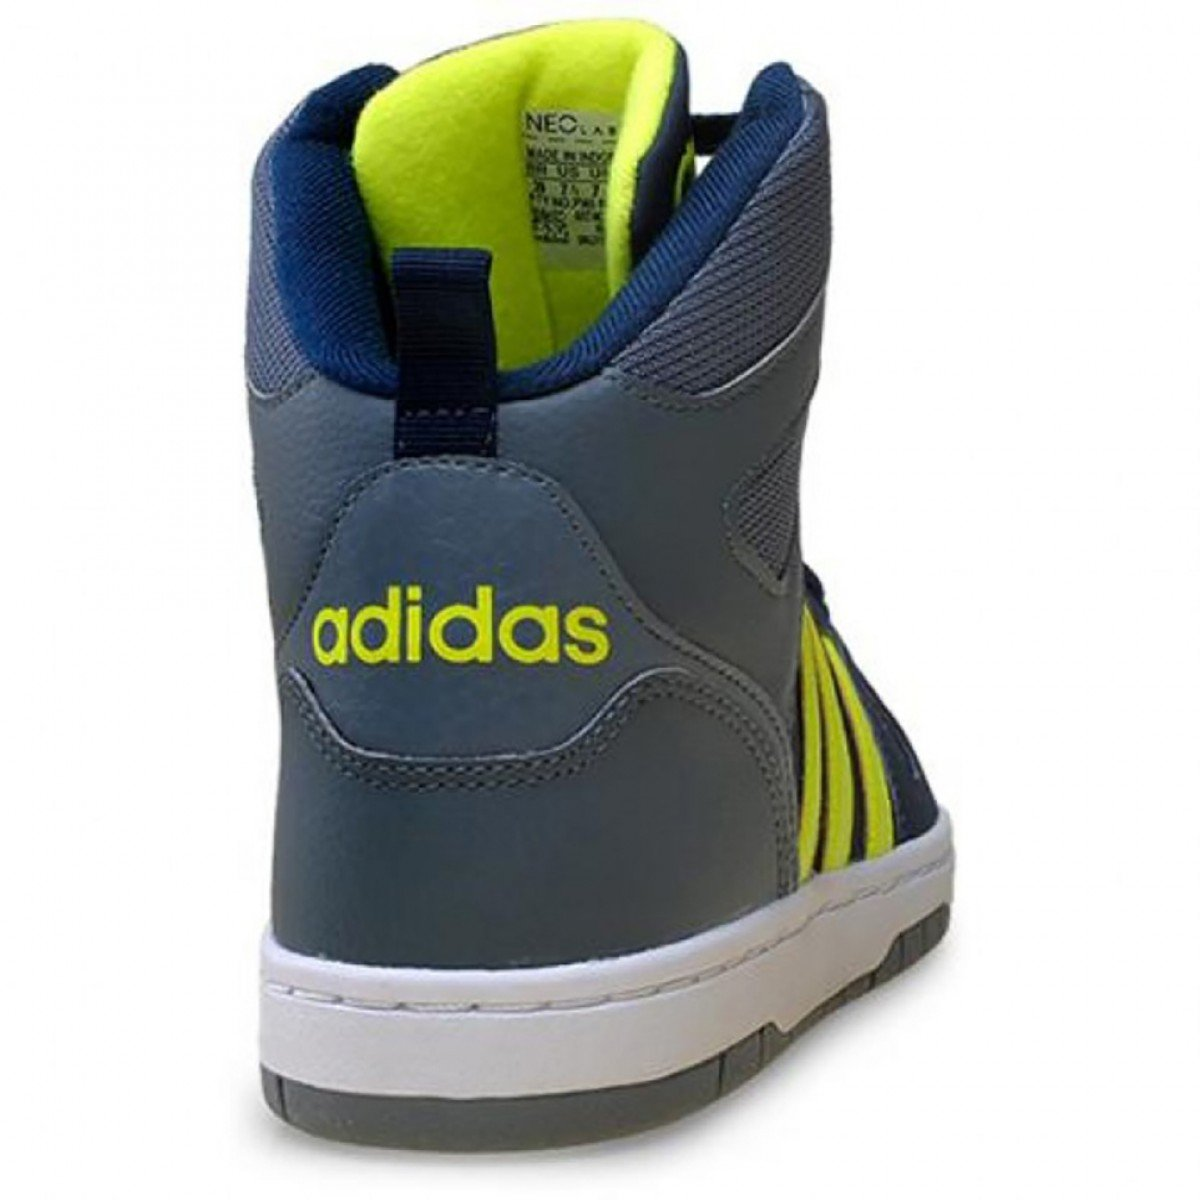 2bd4db9d5a4 Tênis Adidas Neo Hoops Team Mid Masculino Azul e Verde - Compre ...